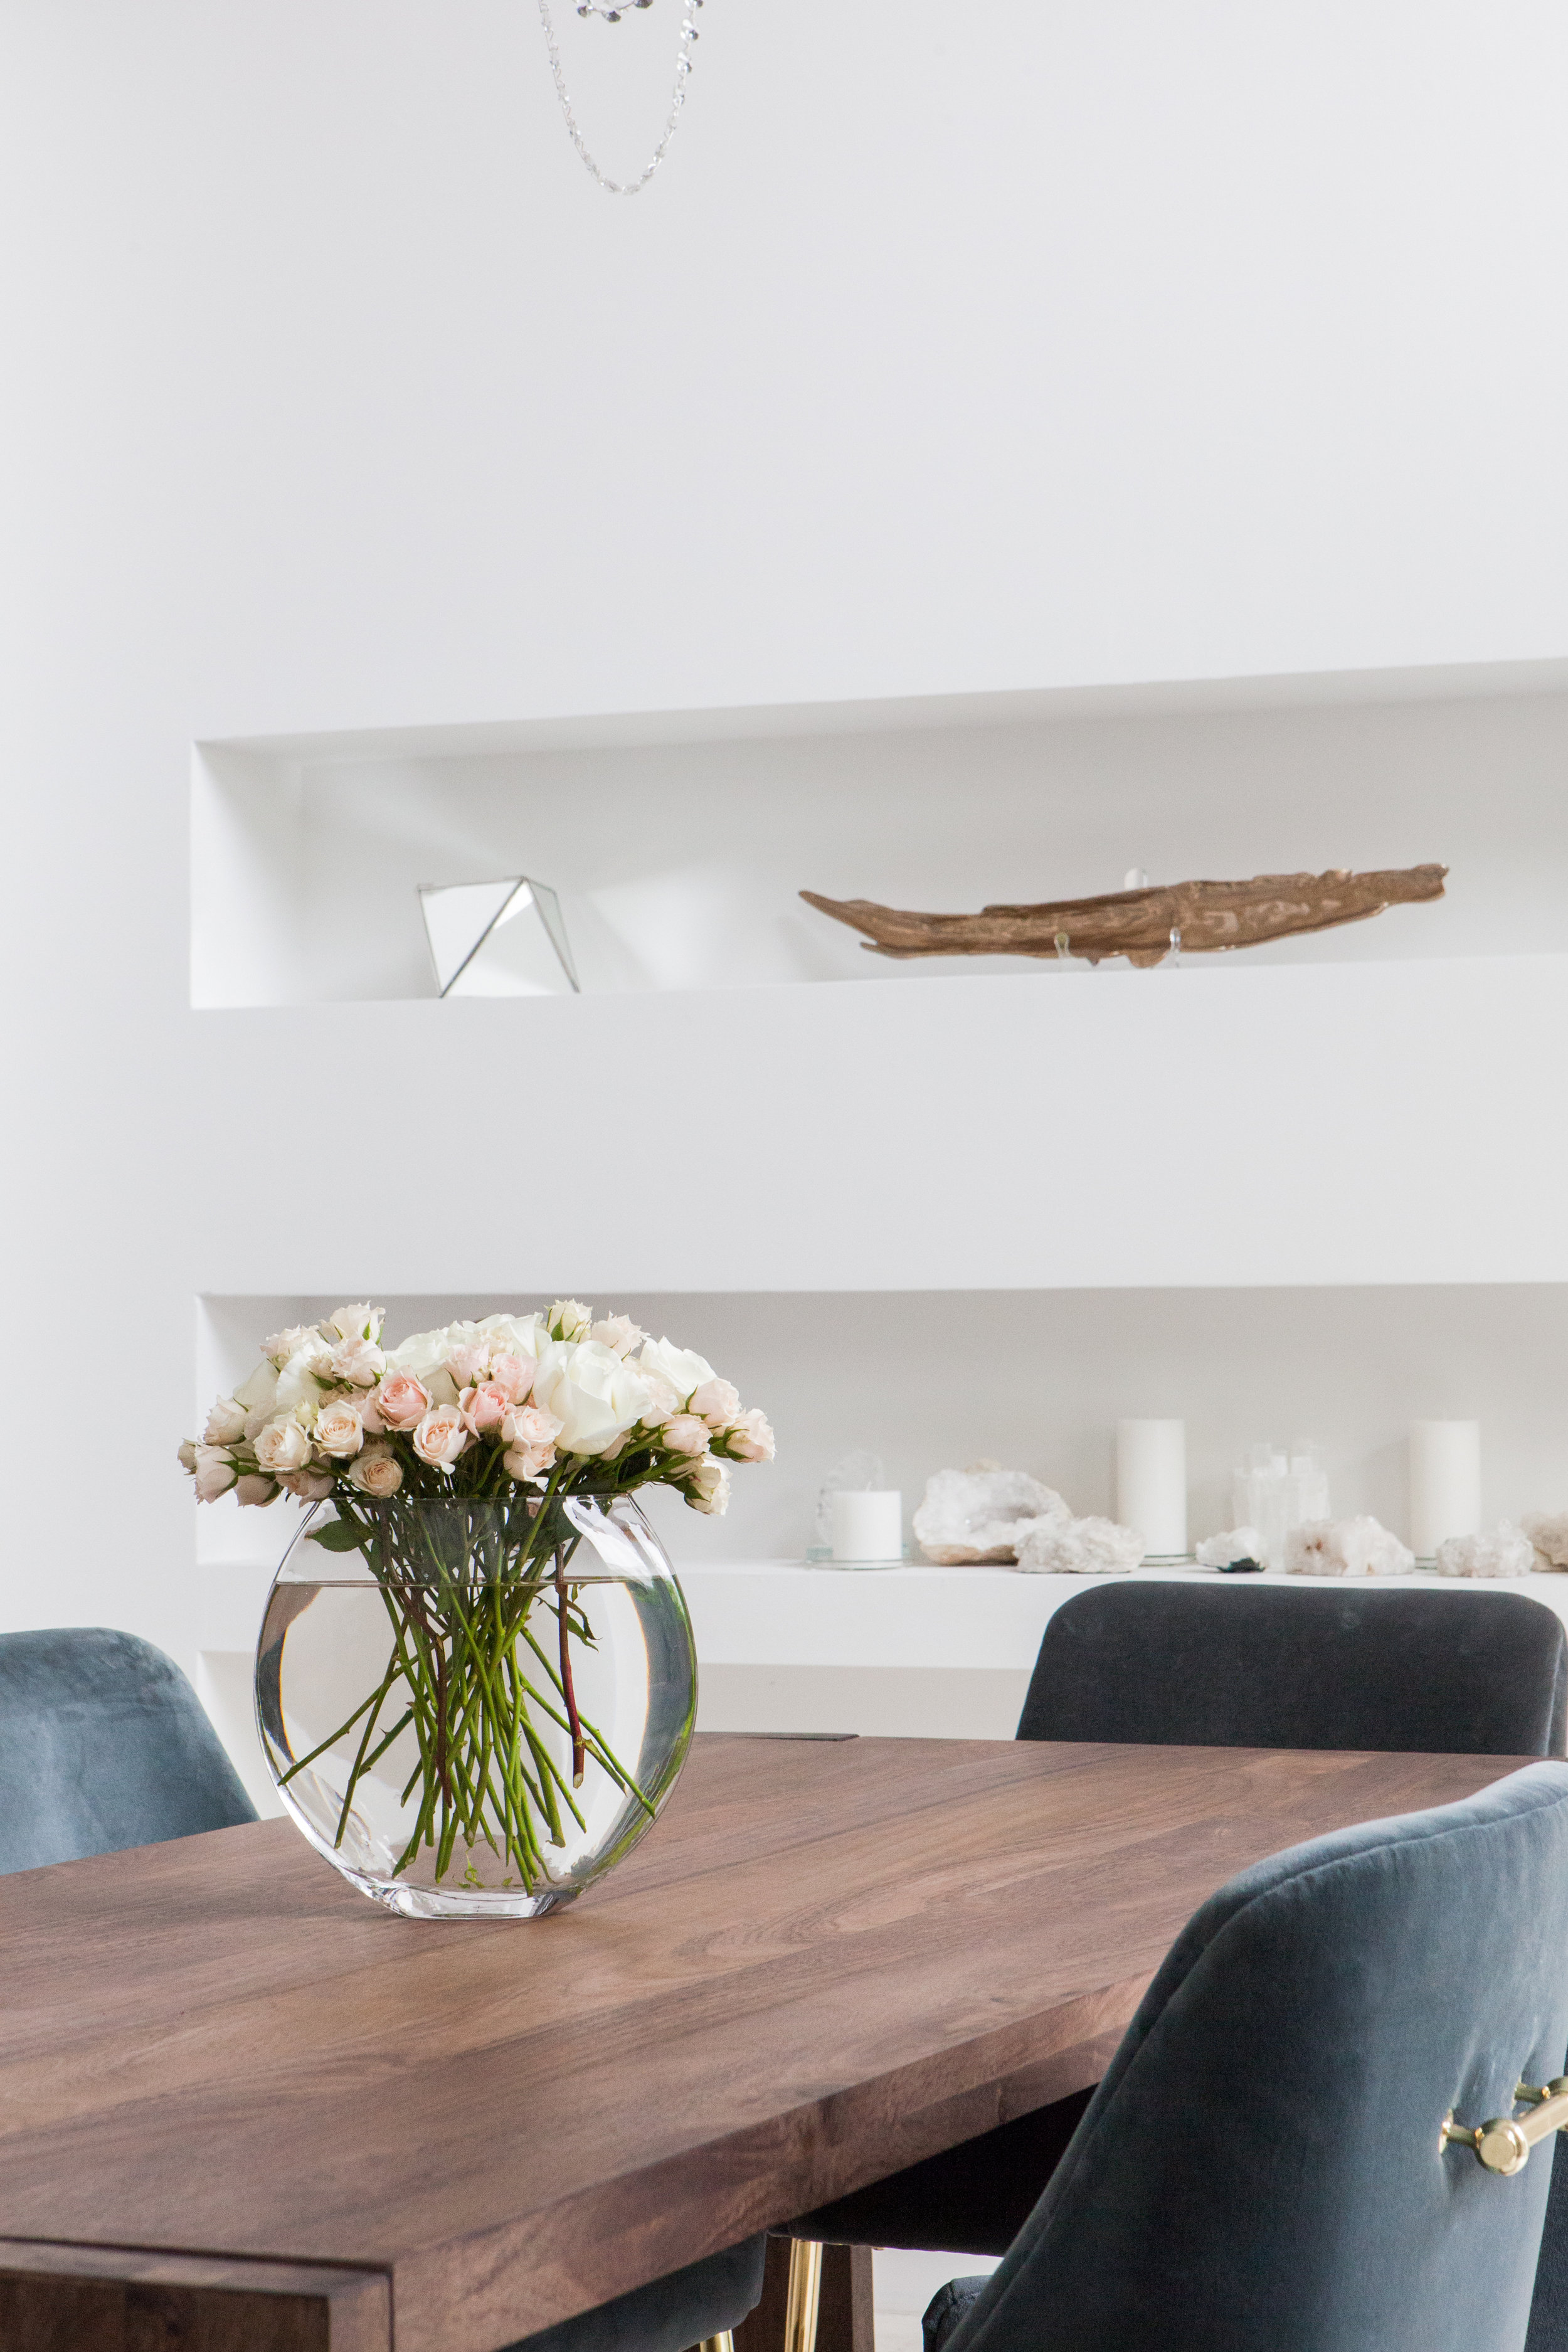 los-angeles-based-interior-designer-scout-modern.jpg